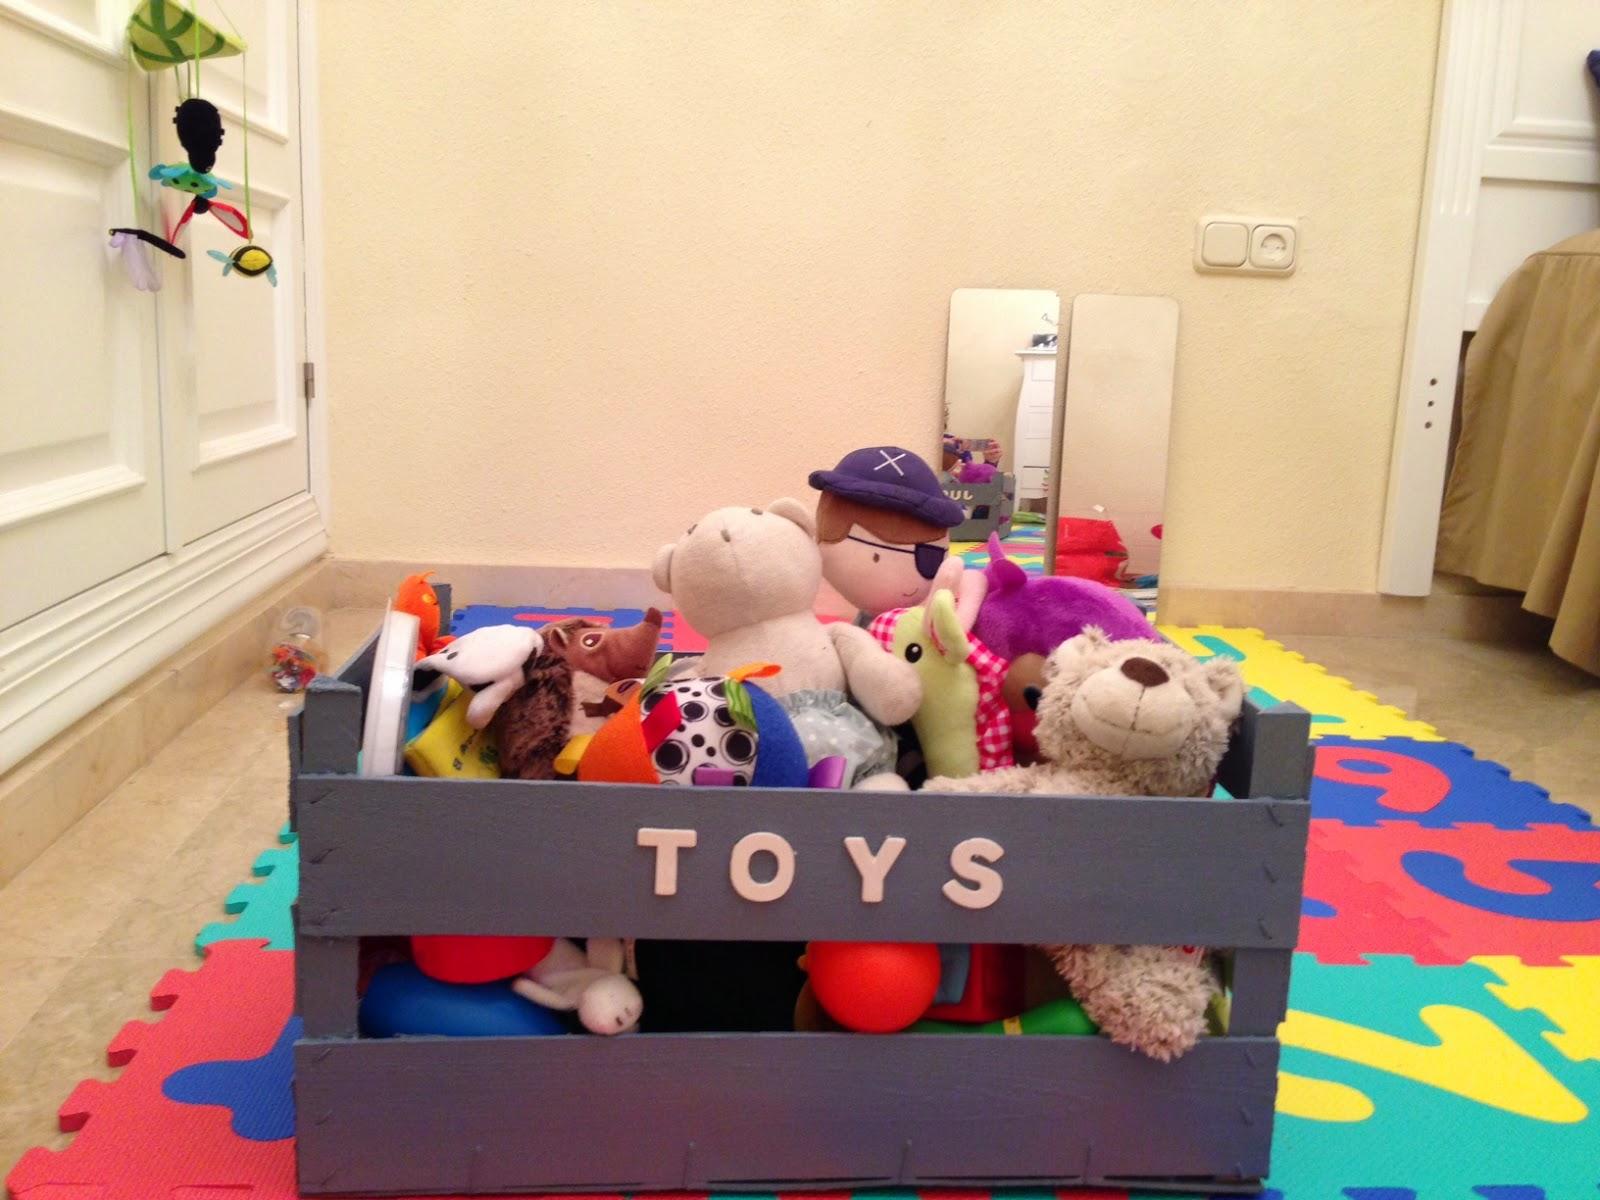 Una caja de frutas para guardar juguetes dyd - Cajas de madera para guardar juguetes ...